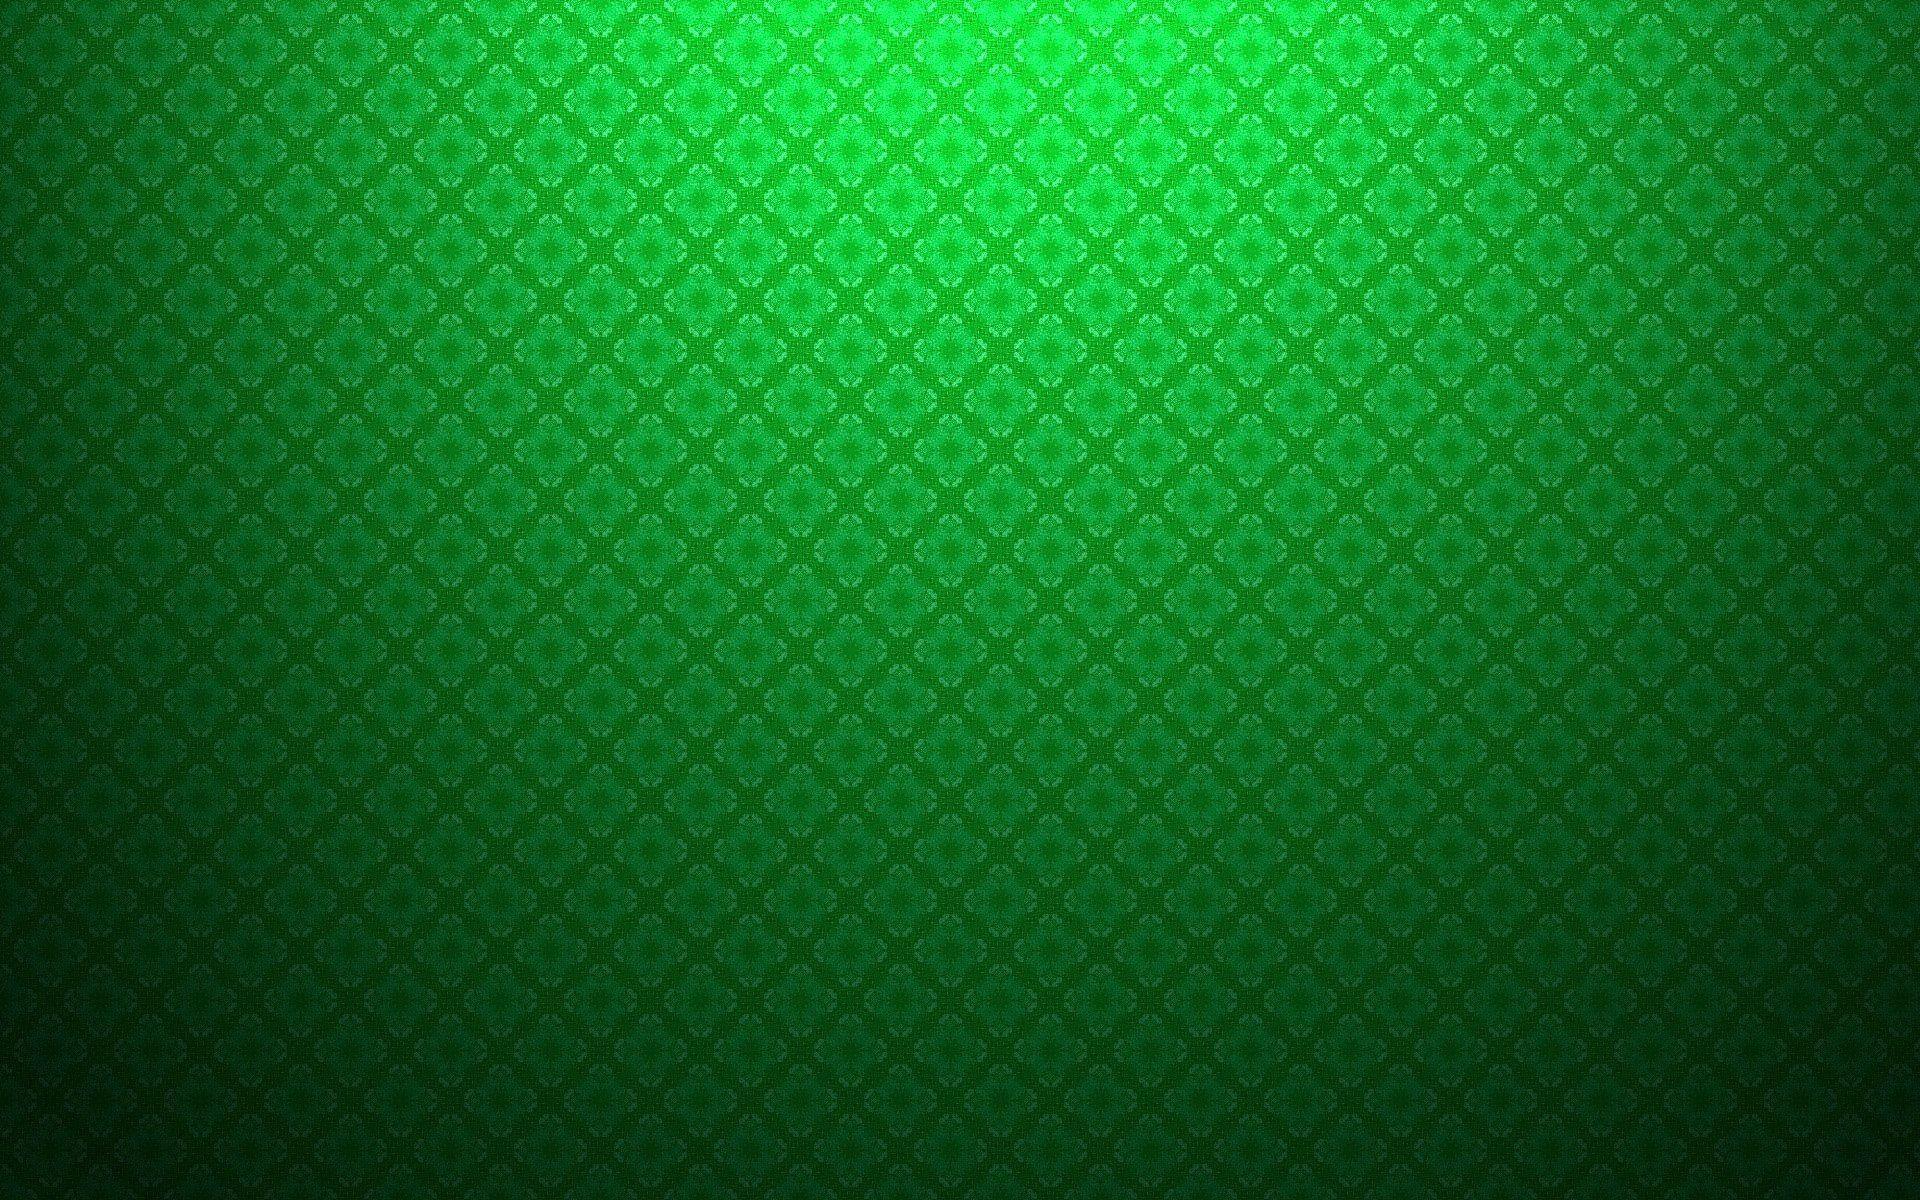 green background 21872 Hijau, Gambar, Seni